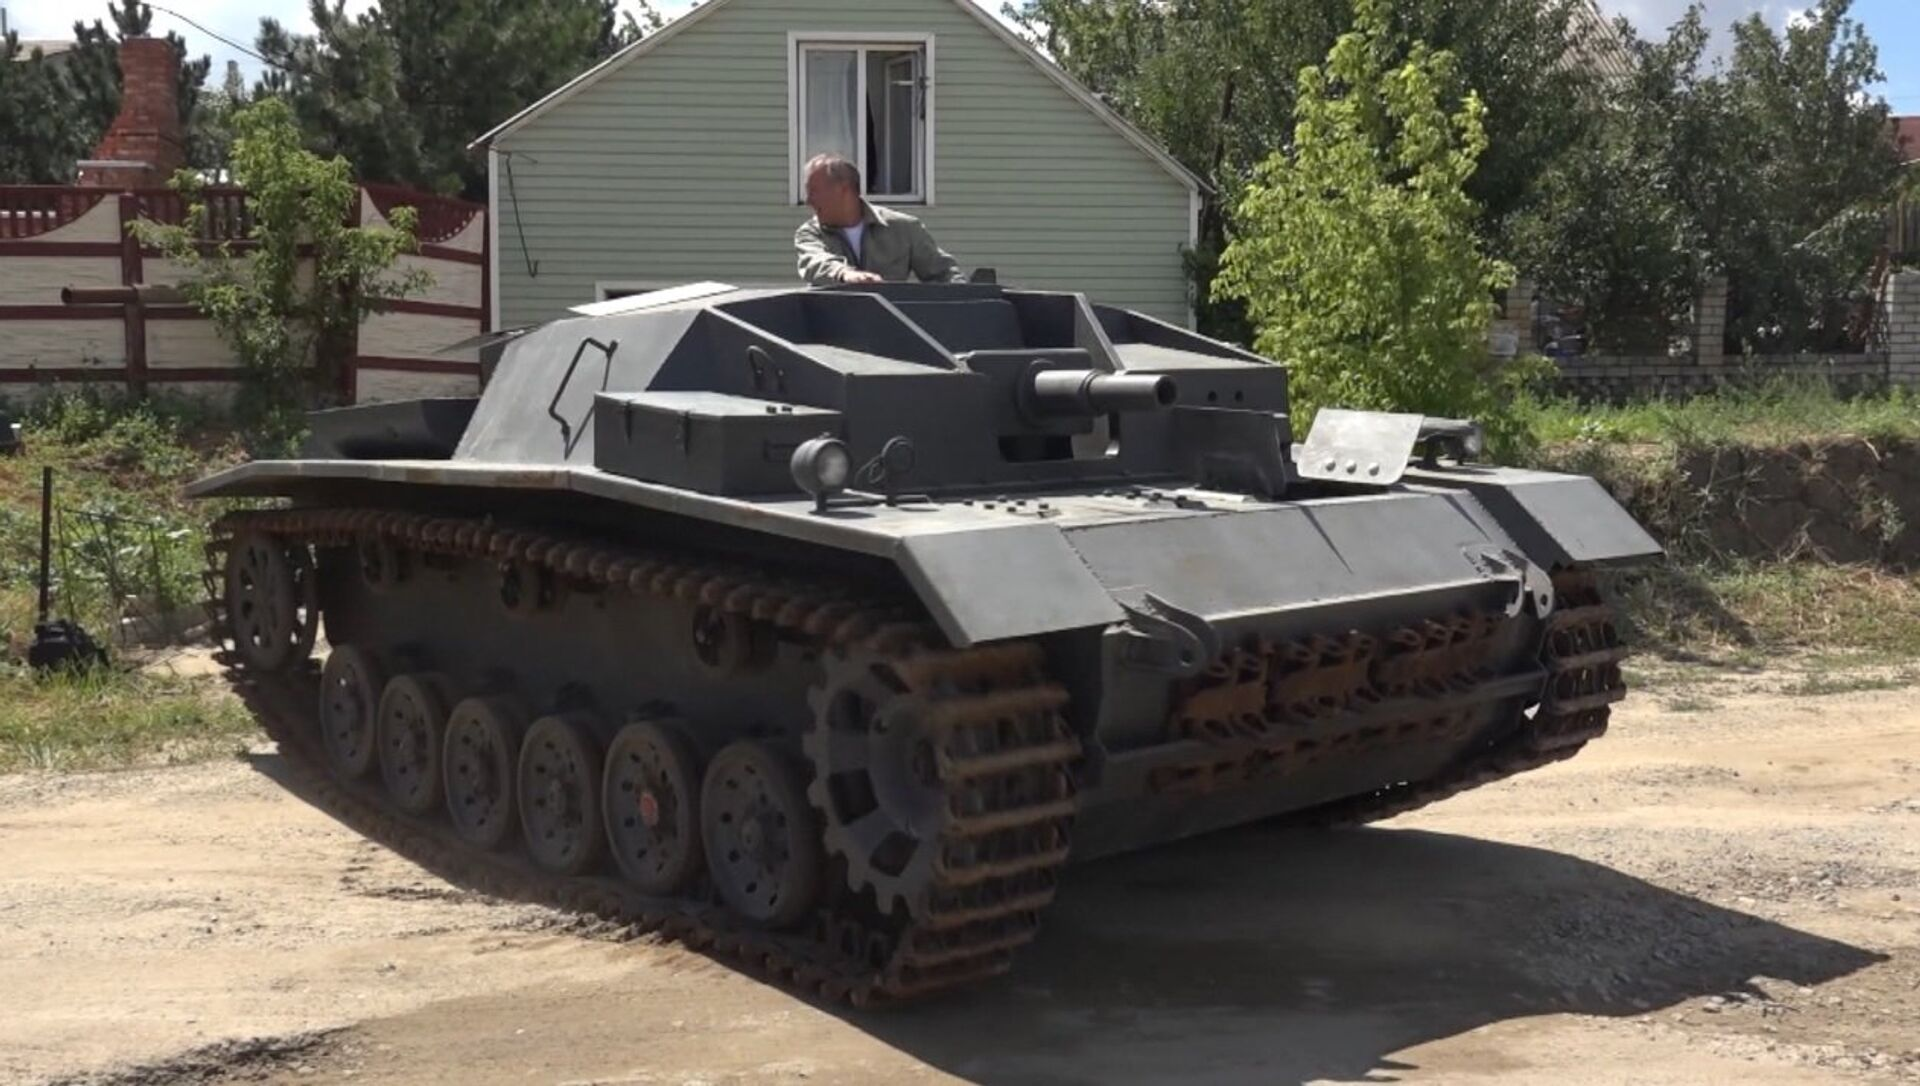 Este ruso replica tanques en su garaje - Sputnik Mundo, 1920, 22.07.2018